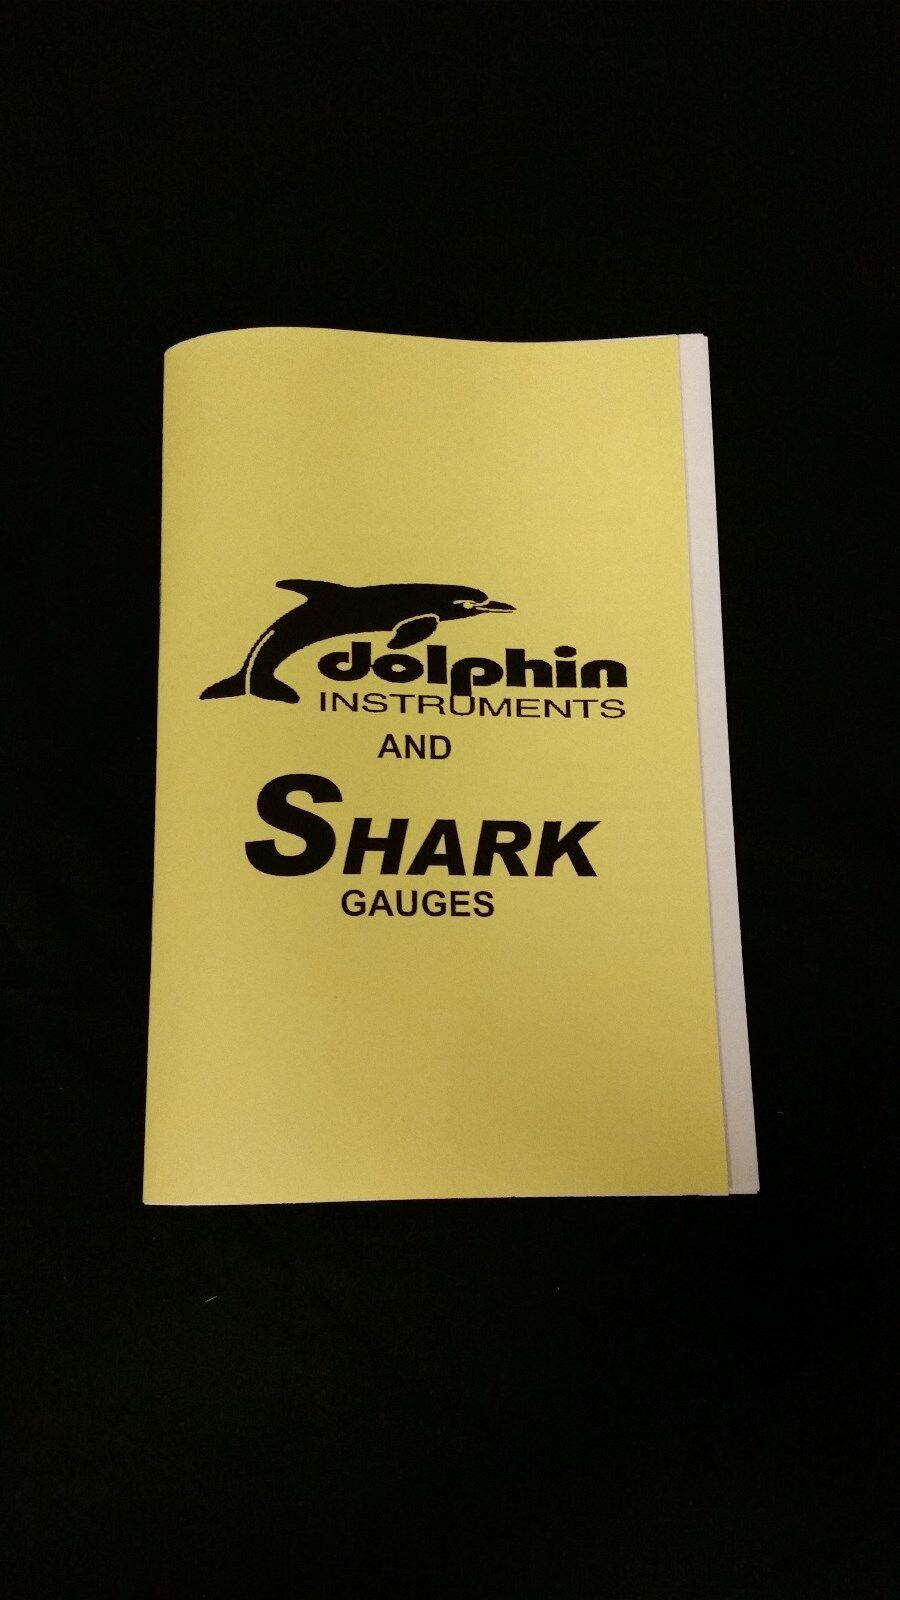 1963 1964 1965 Chevy Nova 3 Gauge Cluster Shark 32000 Picclick Headlight Wiring 2 Of 4